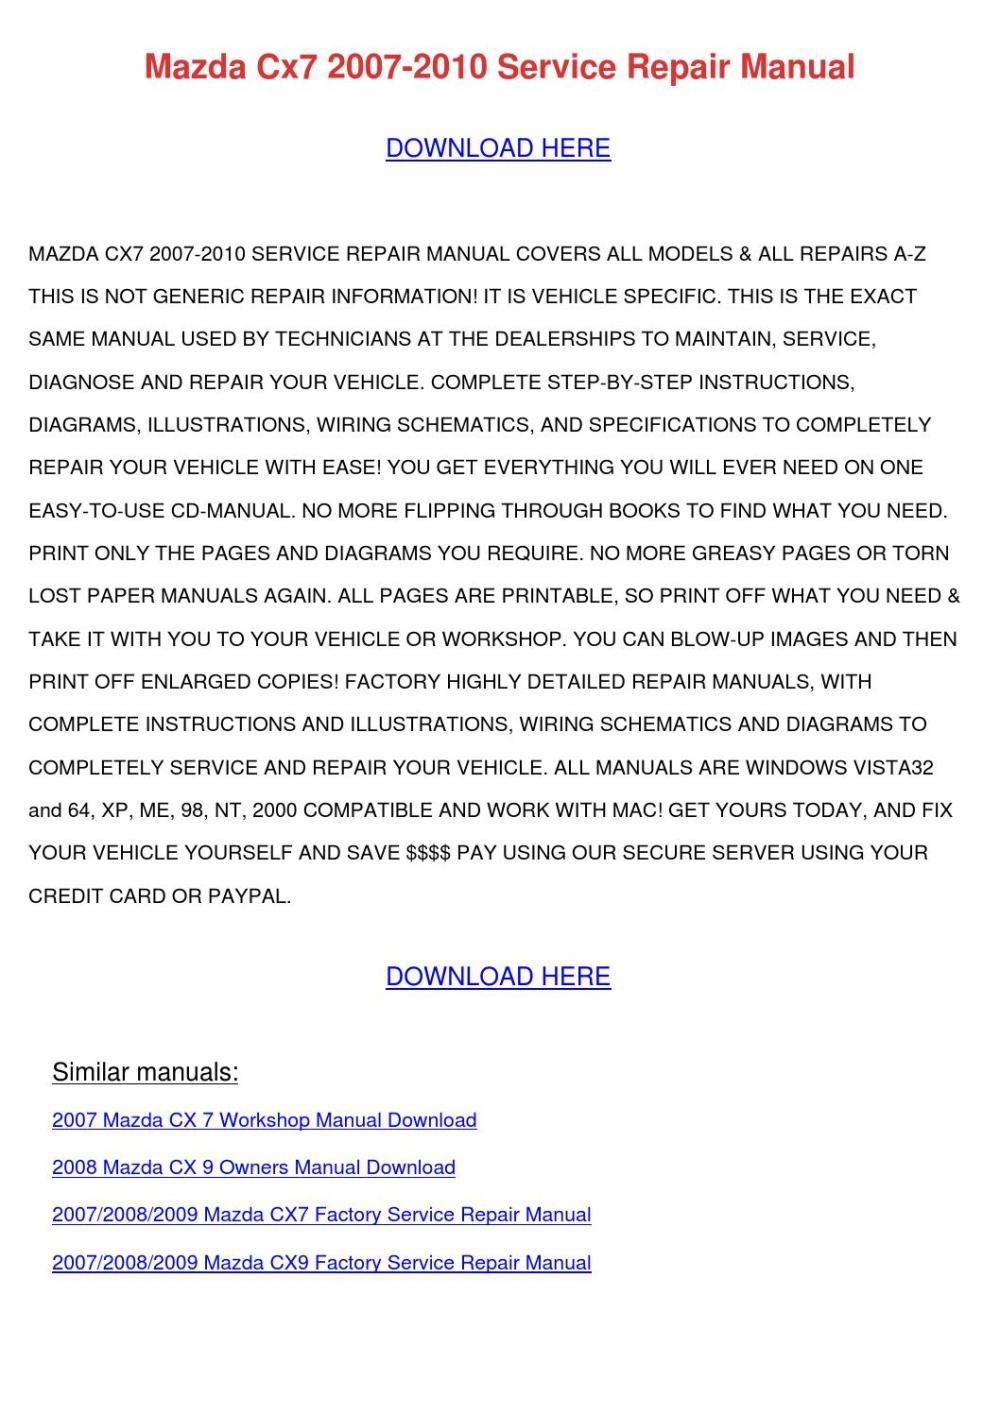 medium resolution of mazda cx7 2007 2010 service repair manual by shonarousseau issuu